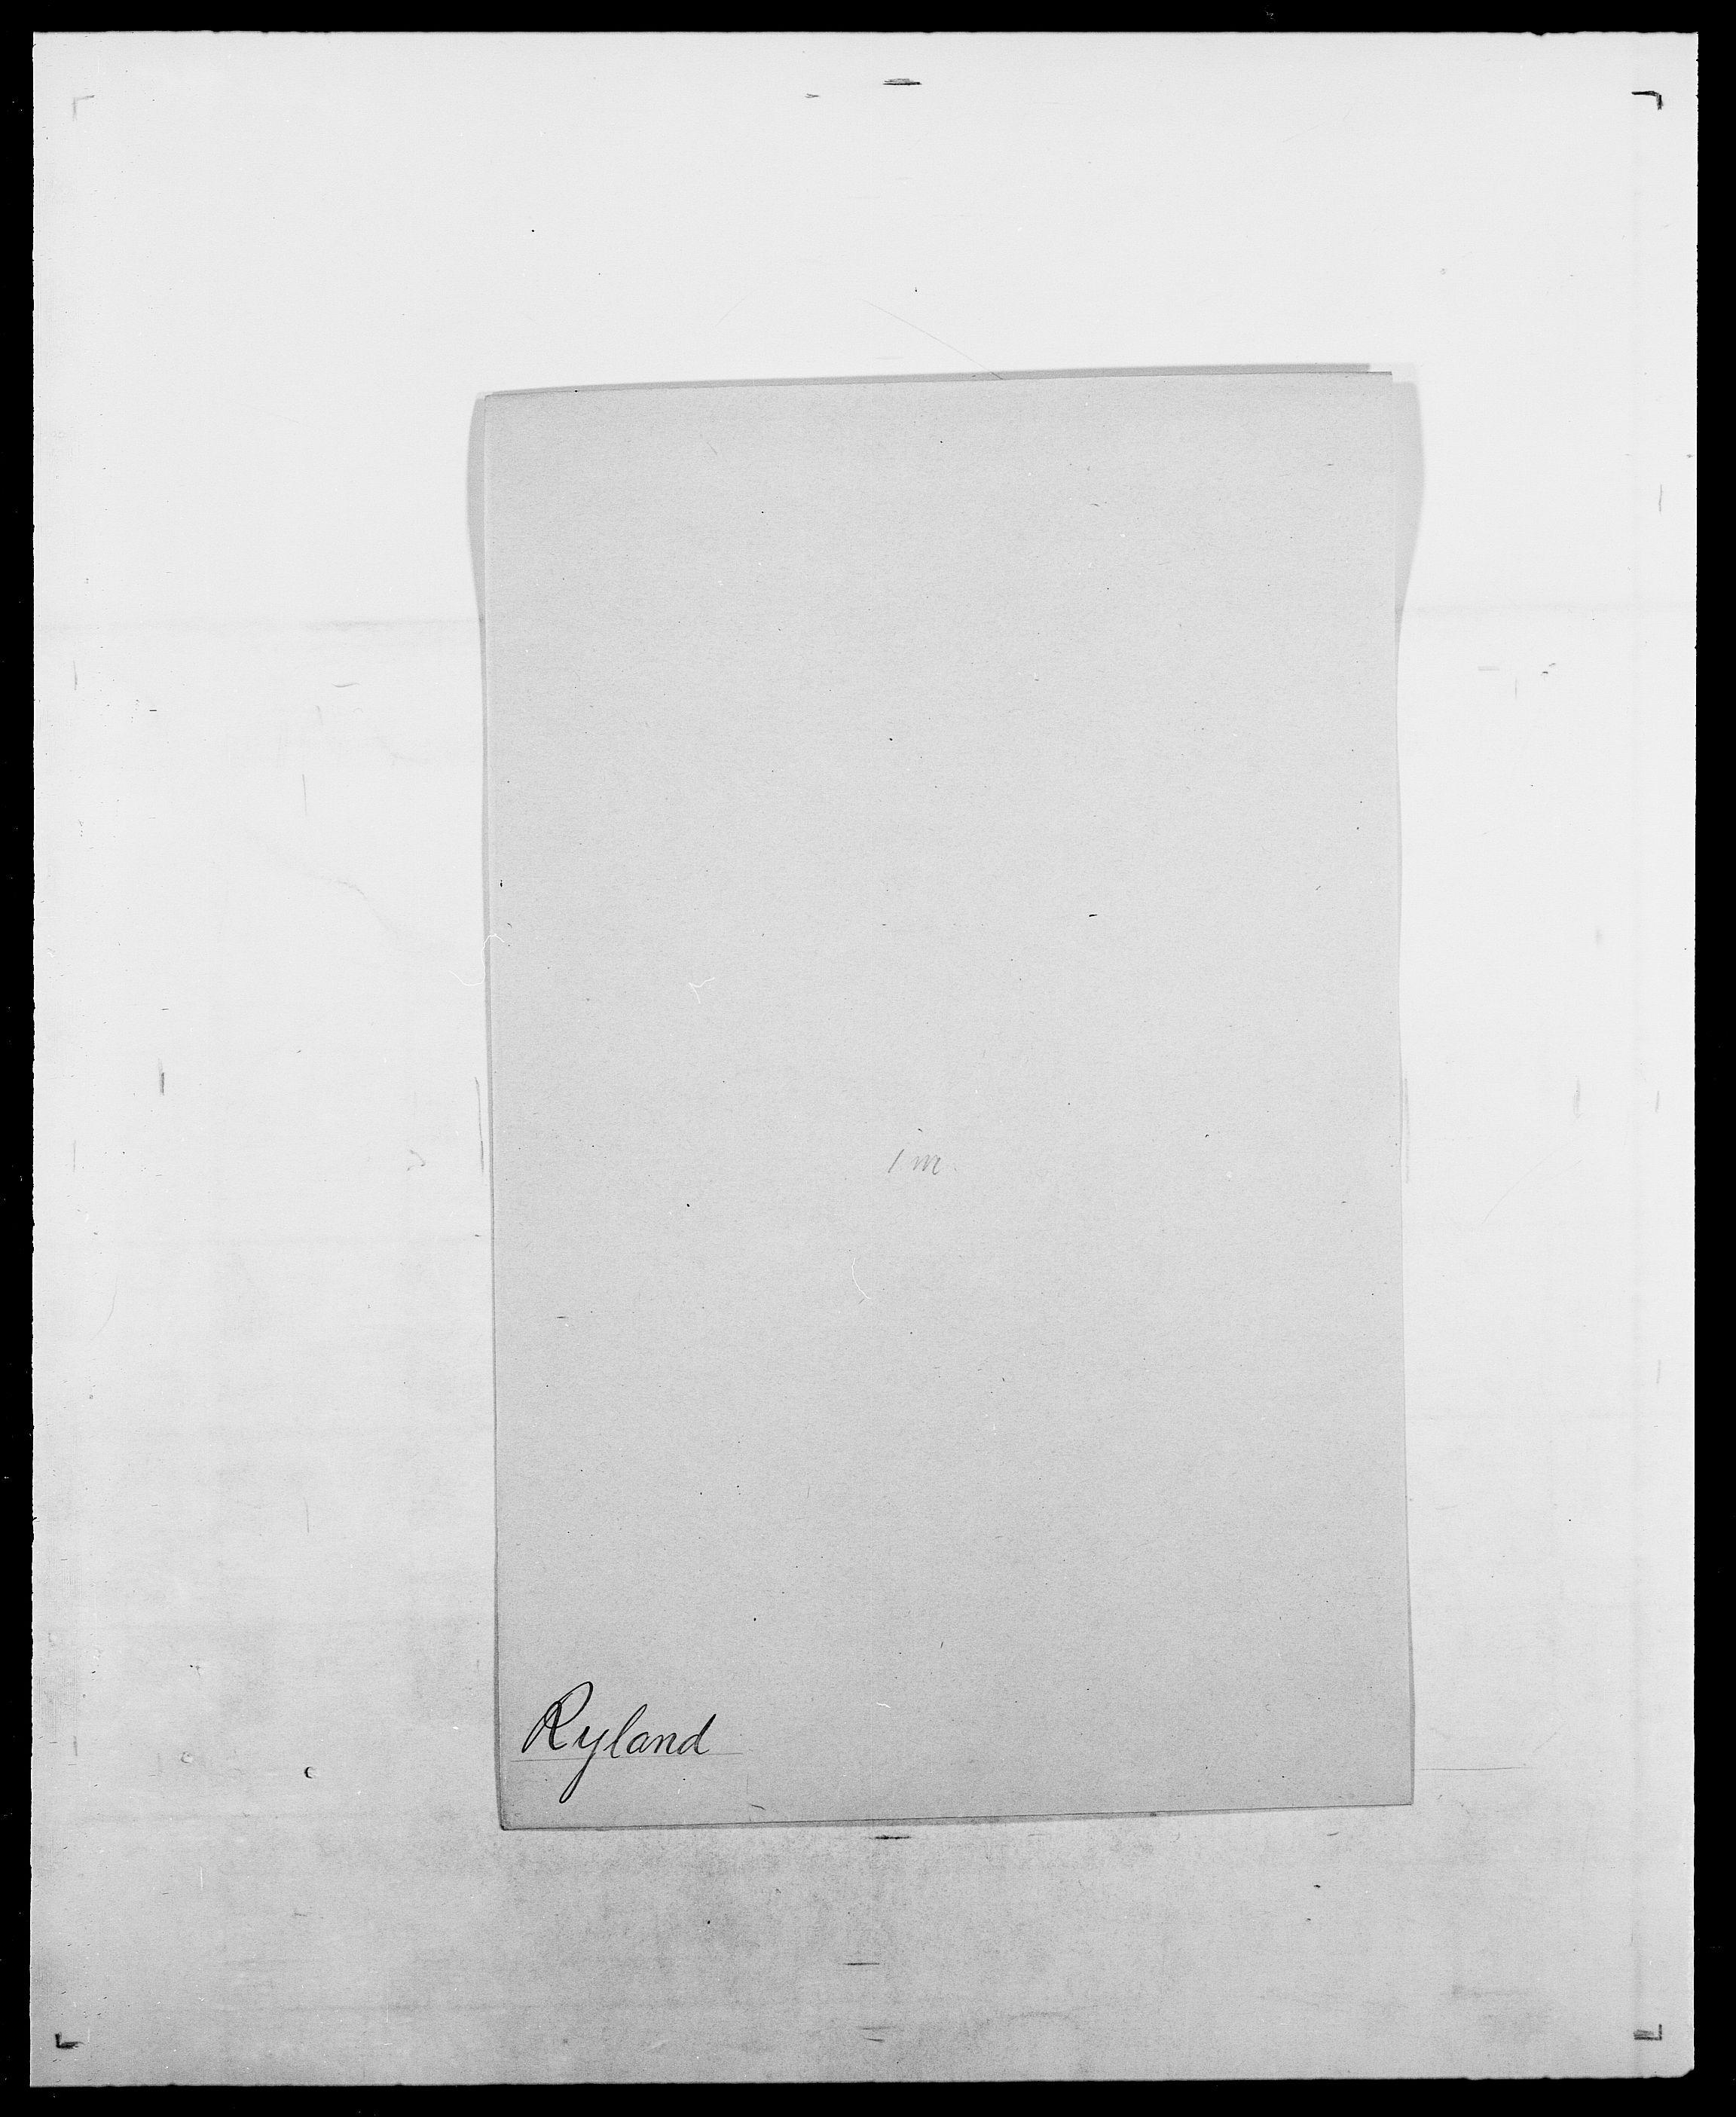 SAO, Delgobe, Charles Antoine - samling, D/Da/L0033: Roald - Røyem, s. 563